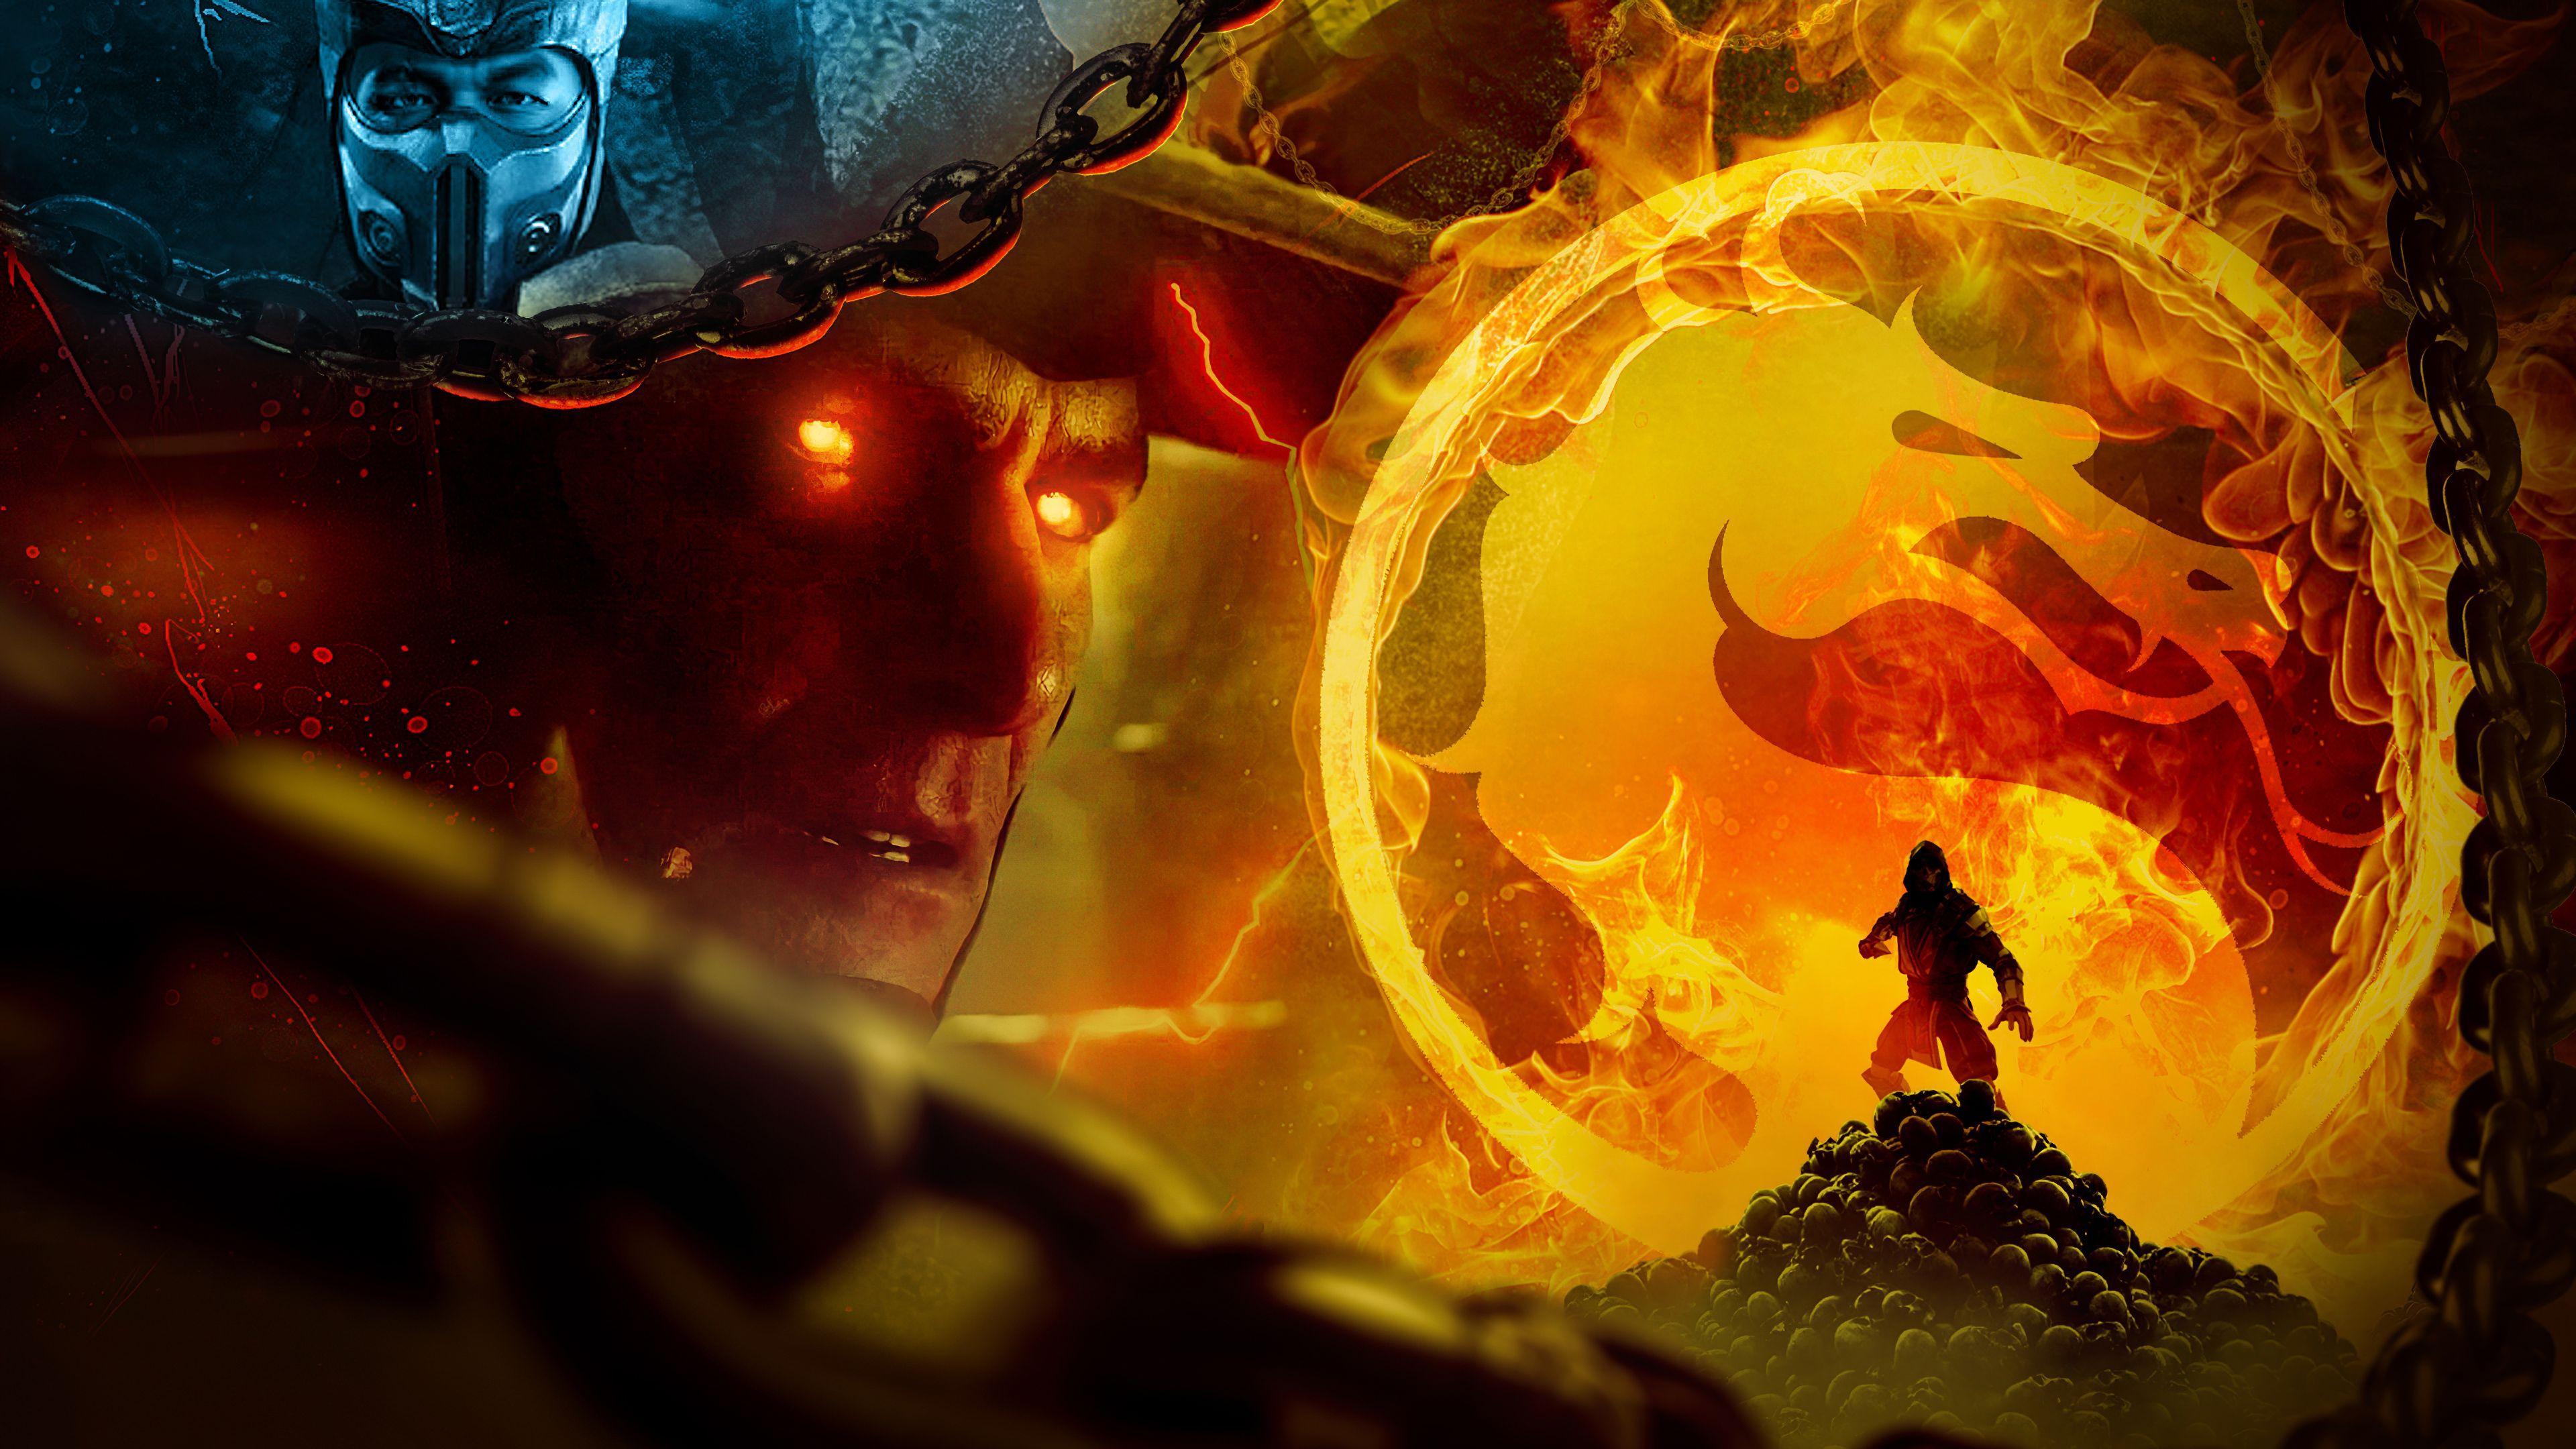 Mortal Kombat 11 4k Wallpapers Top Free Mortal Kombat 11 4k